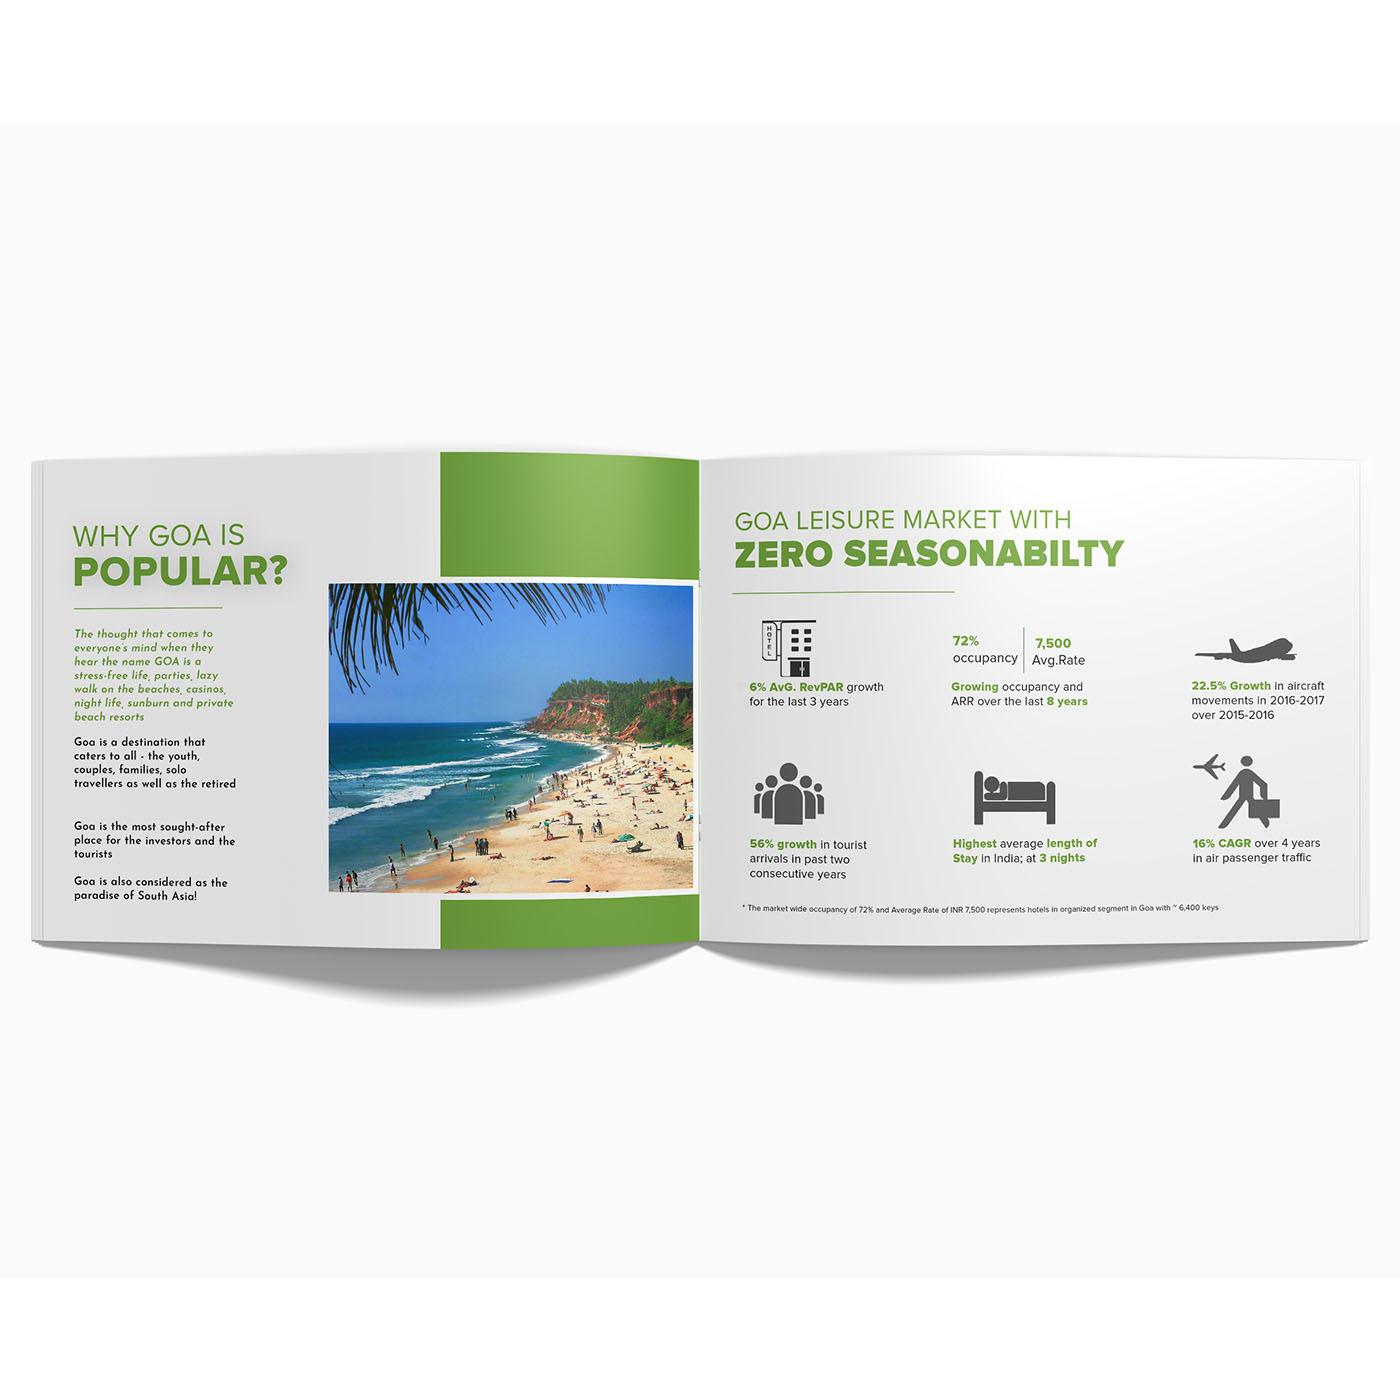 brochure design company profile keynote design presentations print